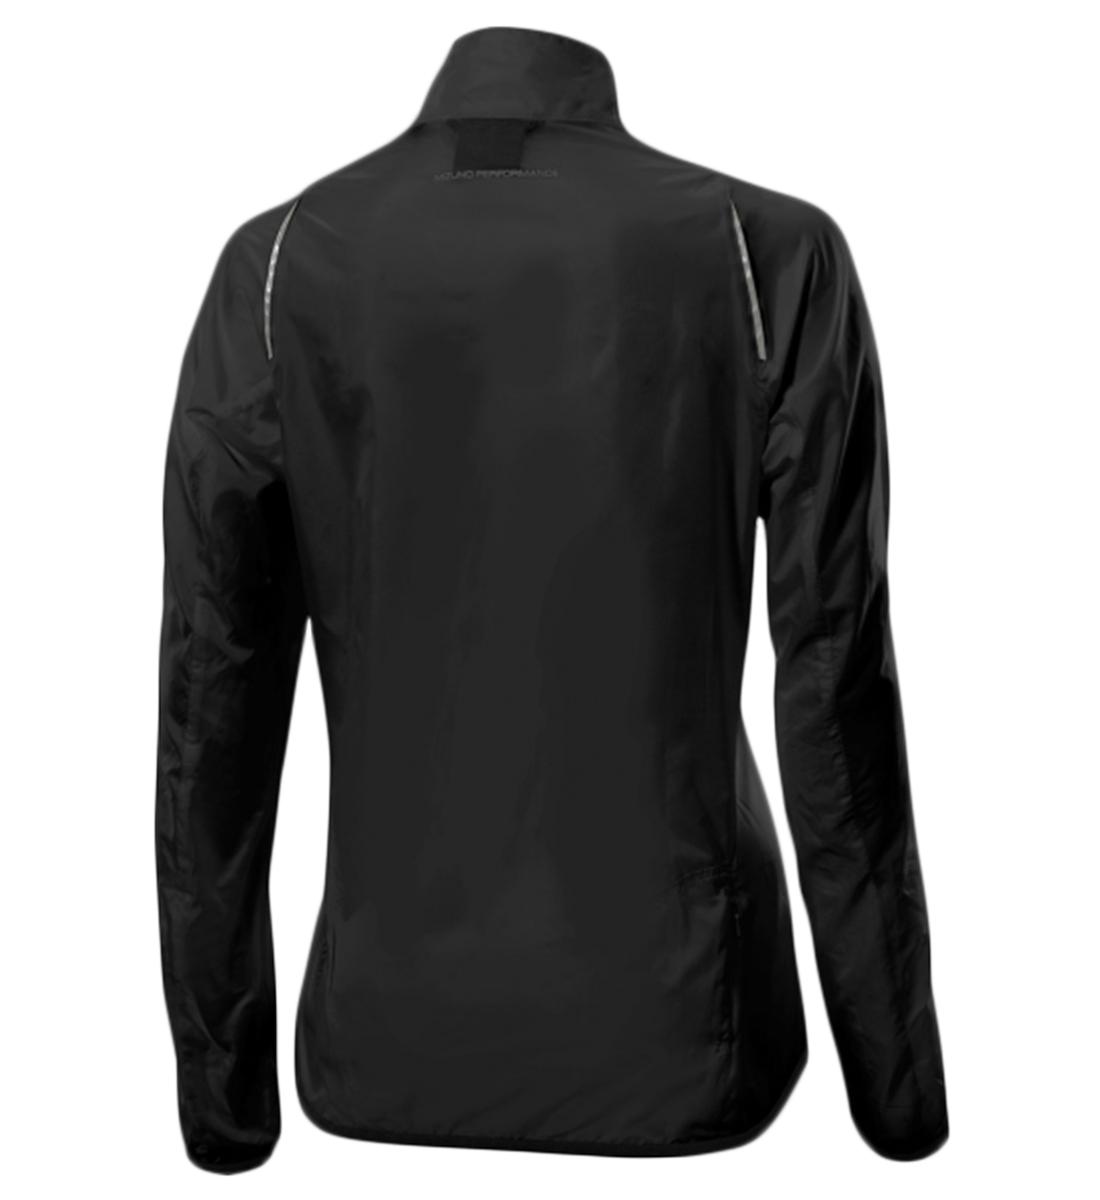 Женская ветрозащитная куртка Mizuno Impermalite (J2GC4201 09) фото